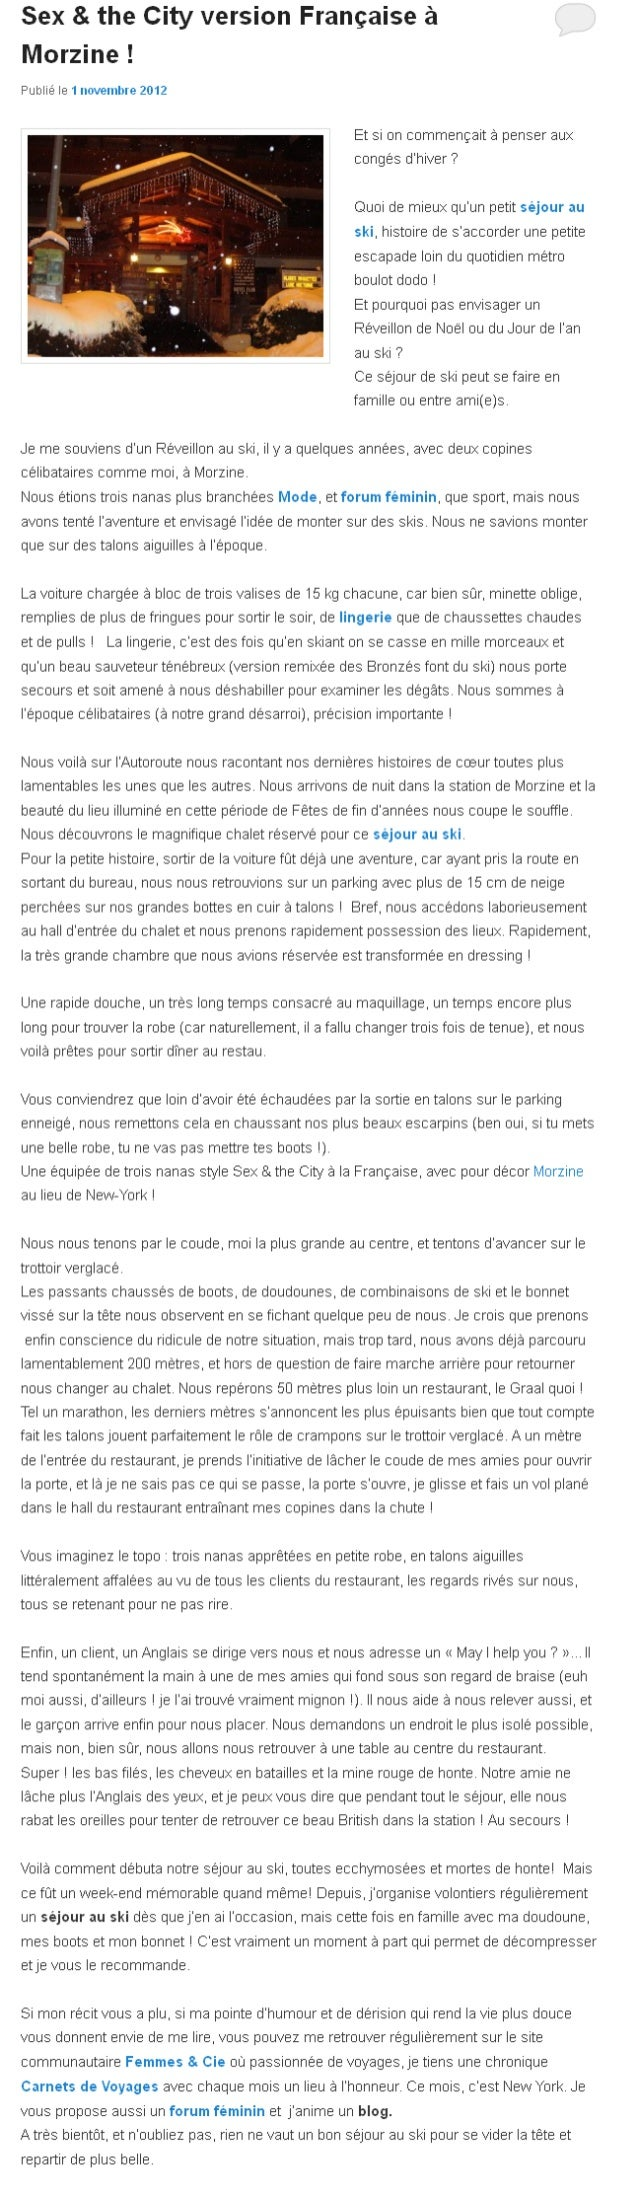 Sex & the City version Française à Morzine !